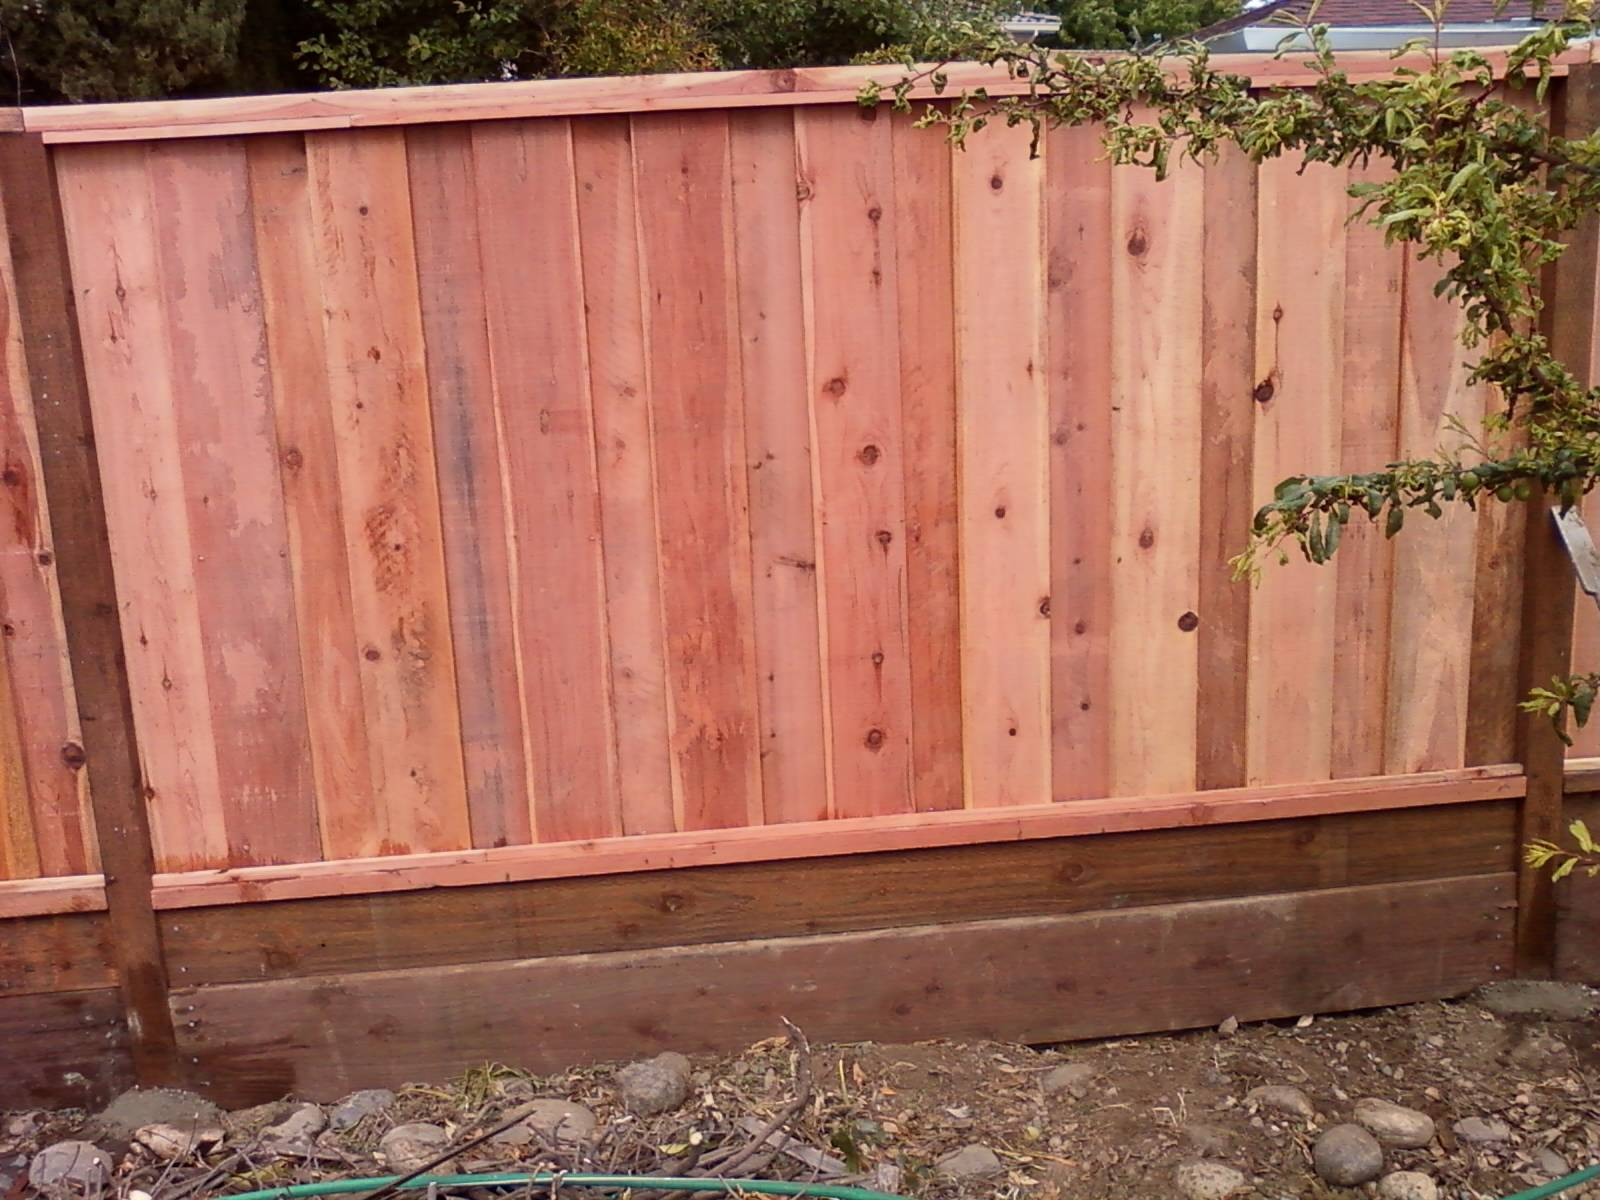 regular fence 6 ft high board on board